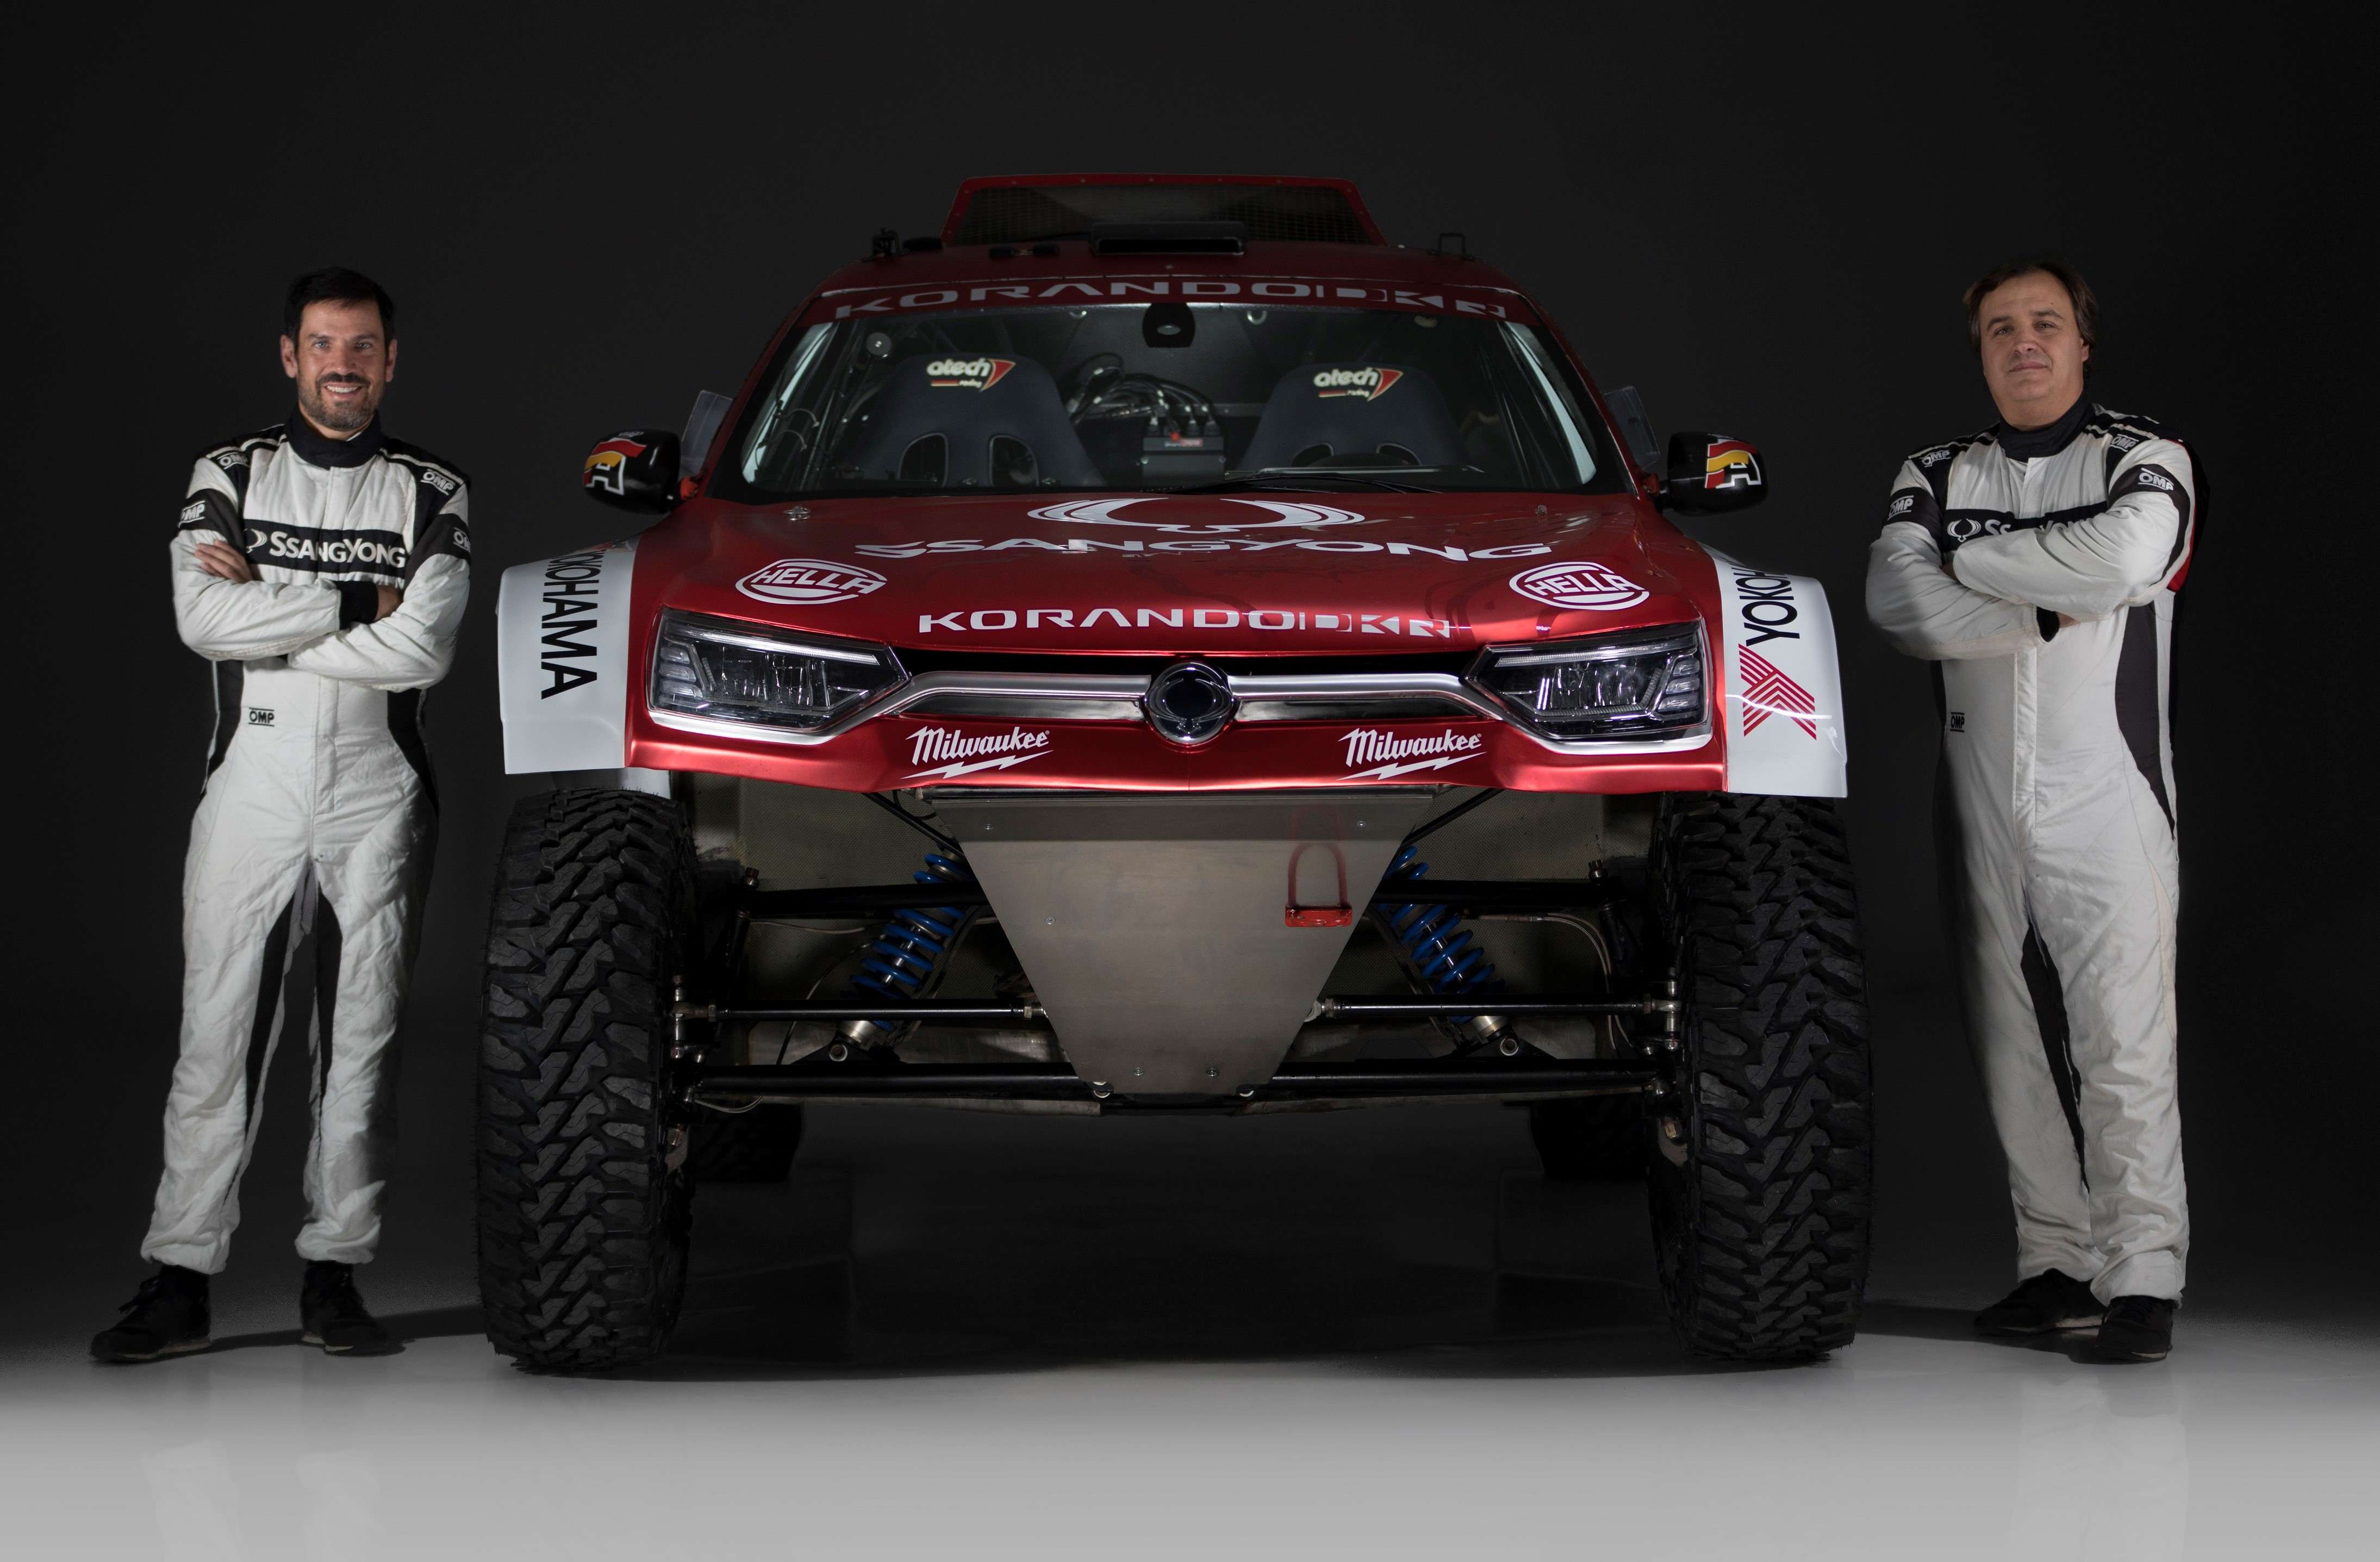 Car with Yokohama Geolander Tires to Compete in 2020 Dakar Rally